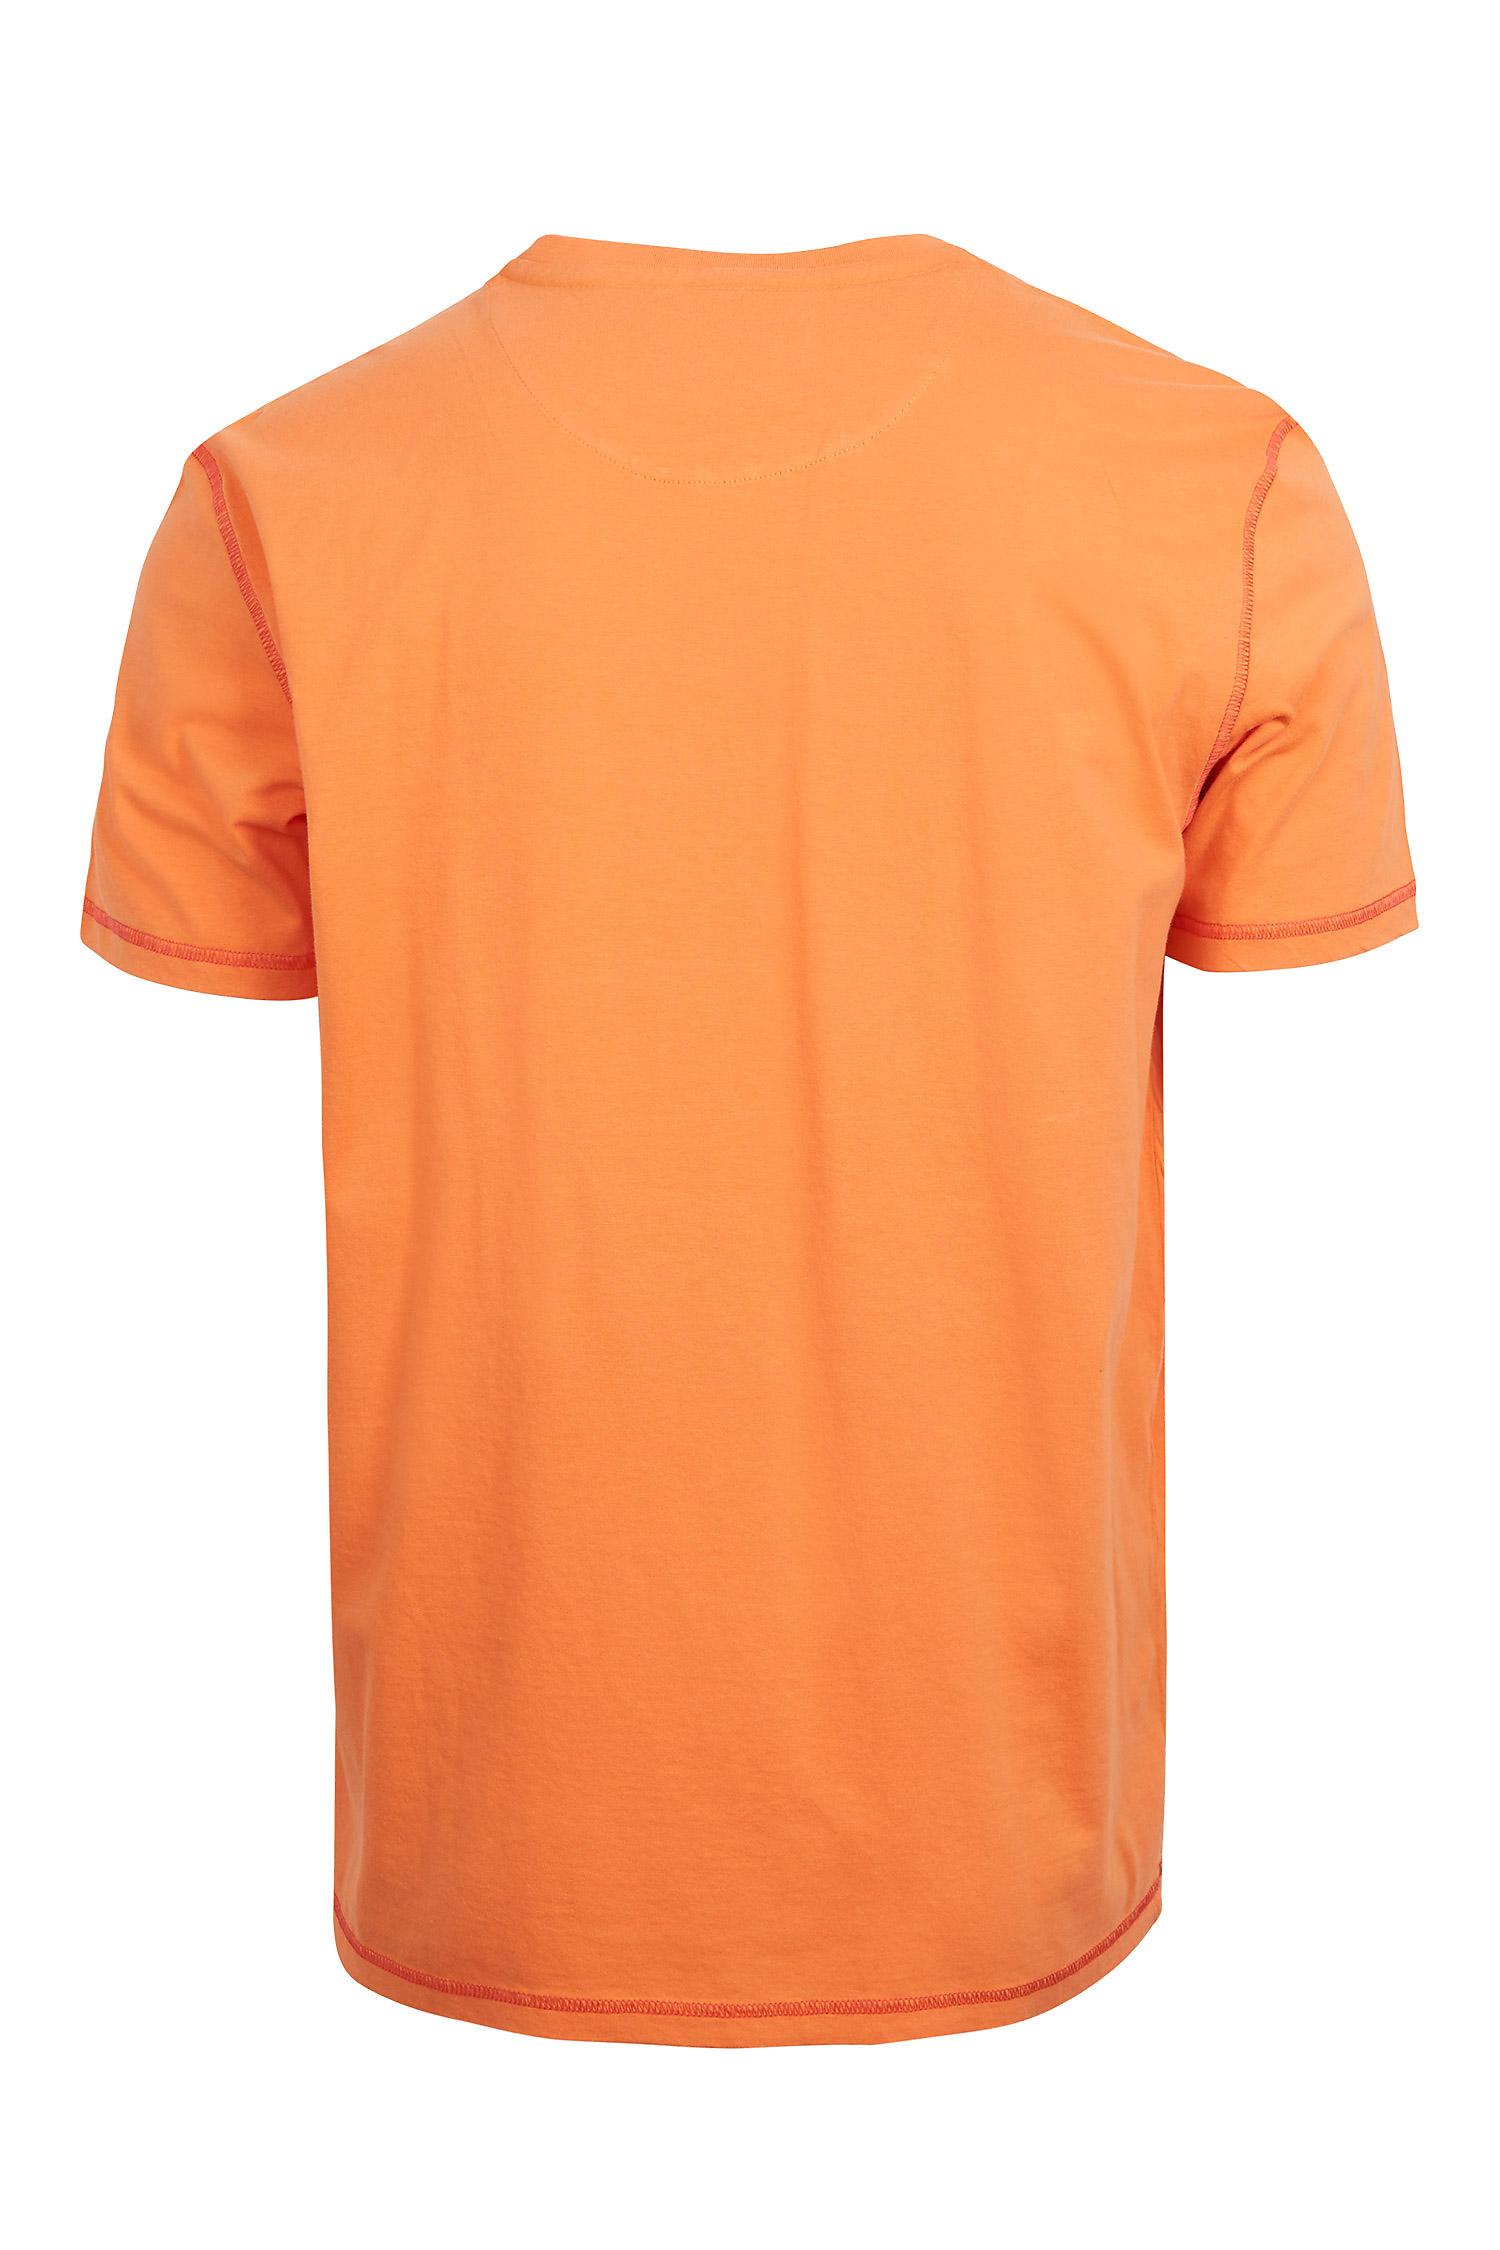 Sport, Camisetas M. Corta, 109105, NARANJA | Zoom